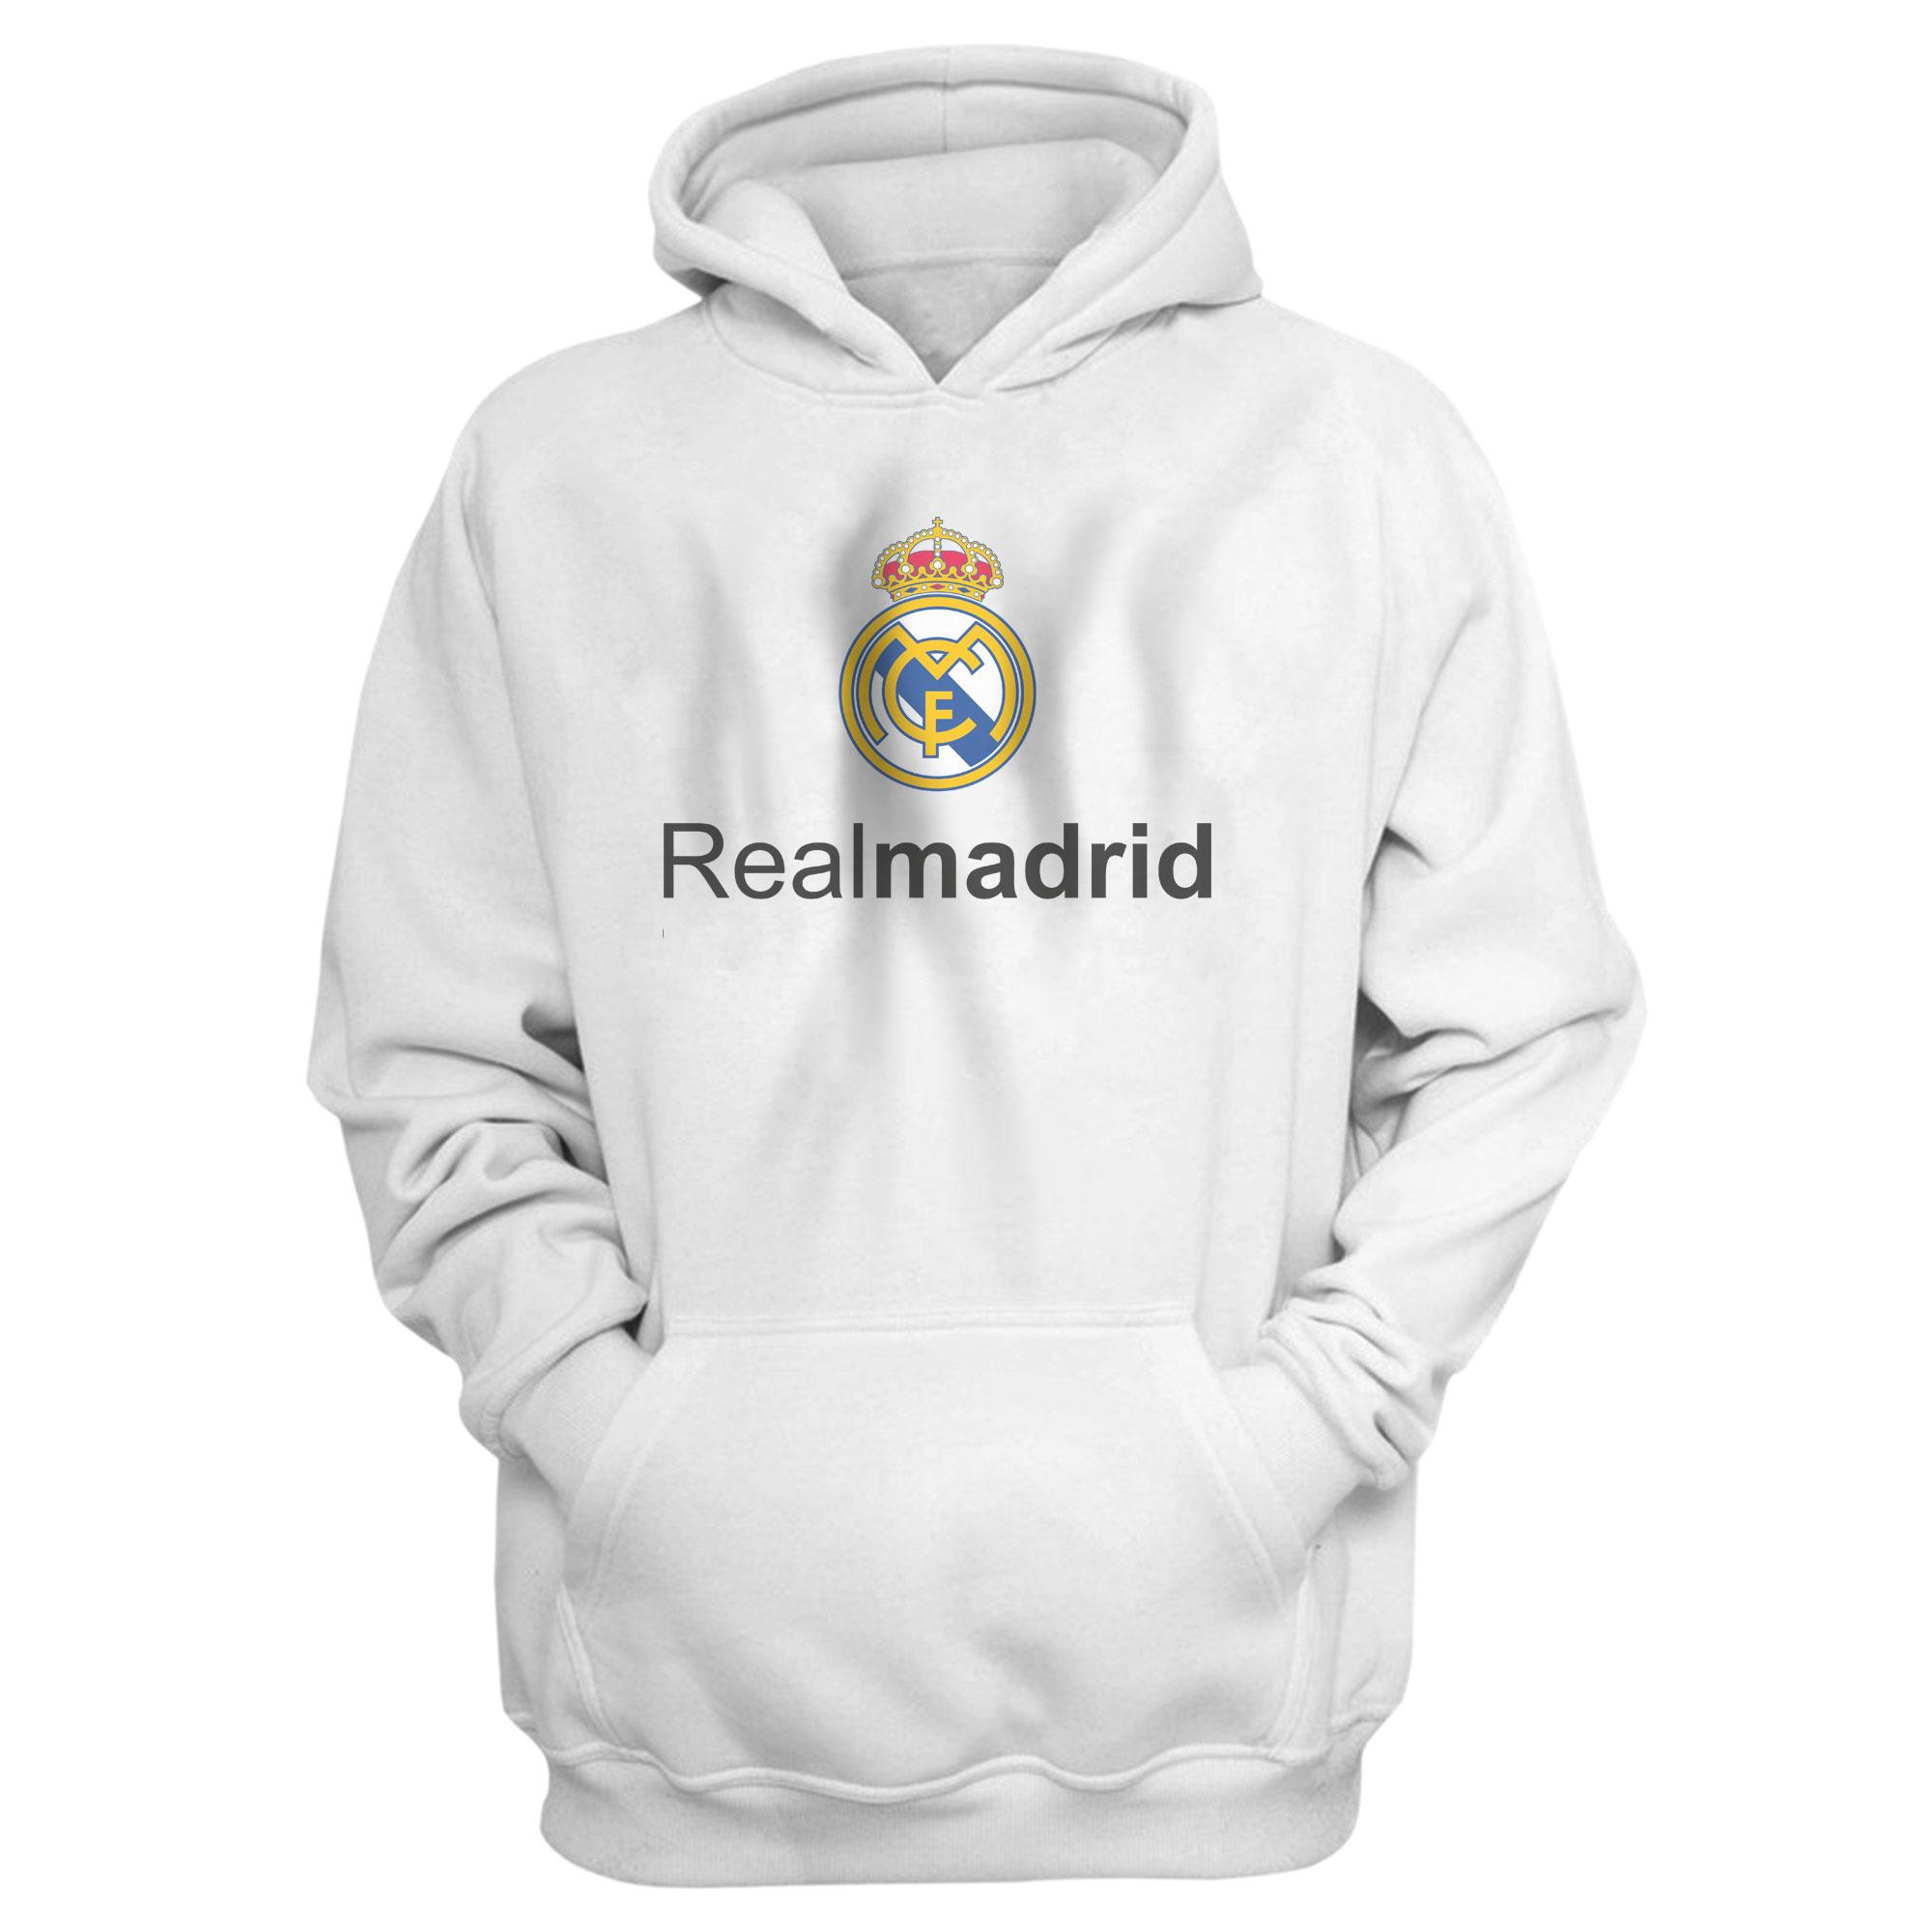 Real Madrid Euroleague Hoodie (HD-WHT-484-realmadrid)